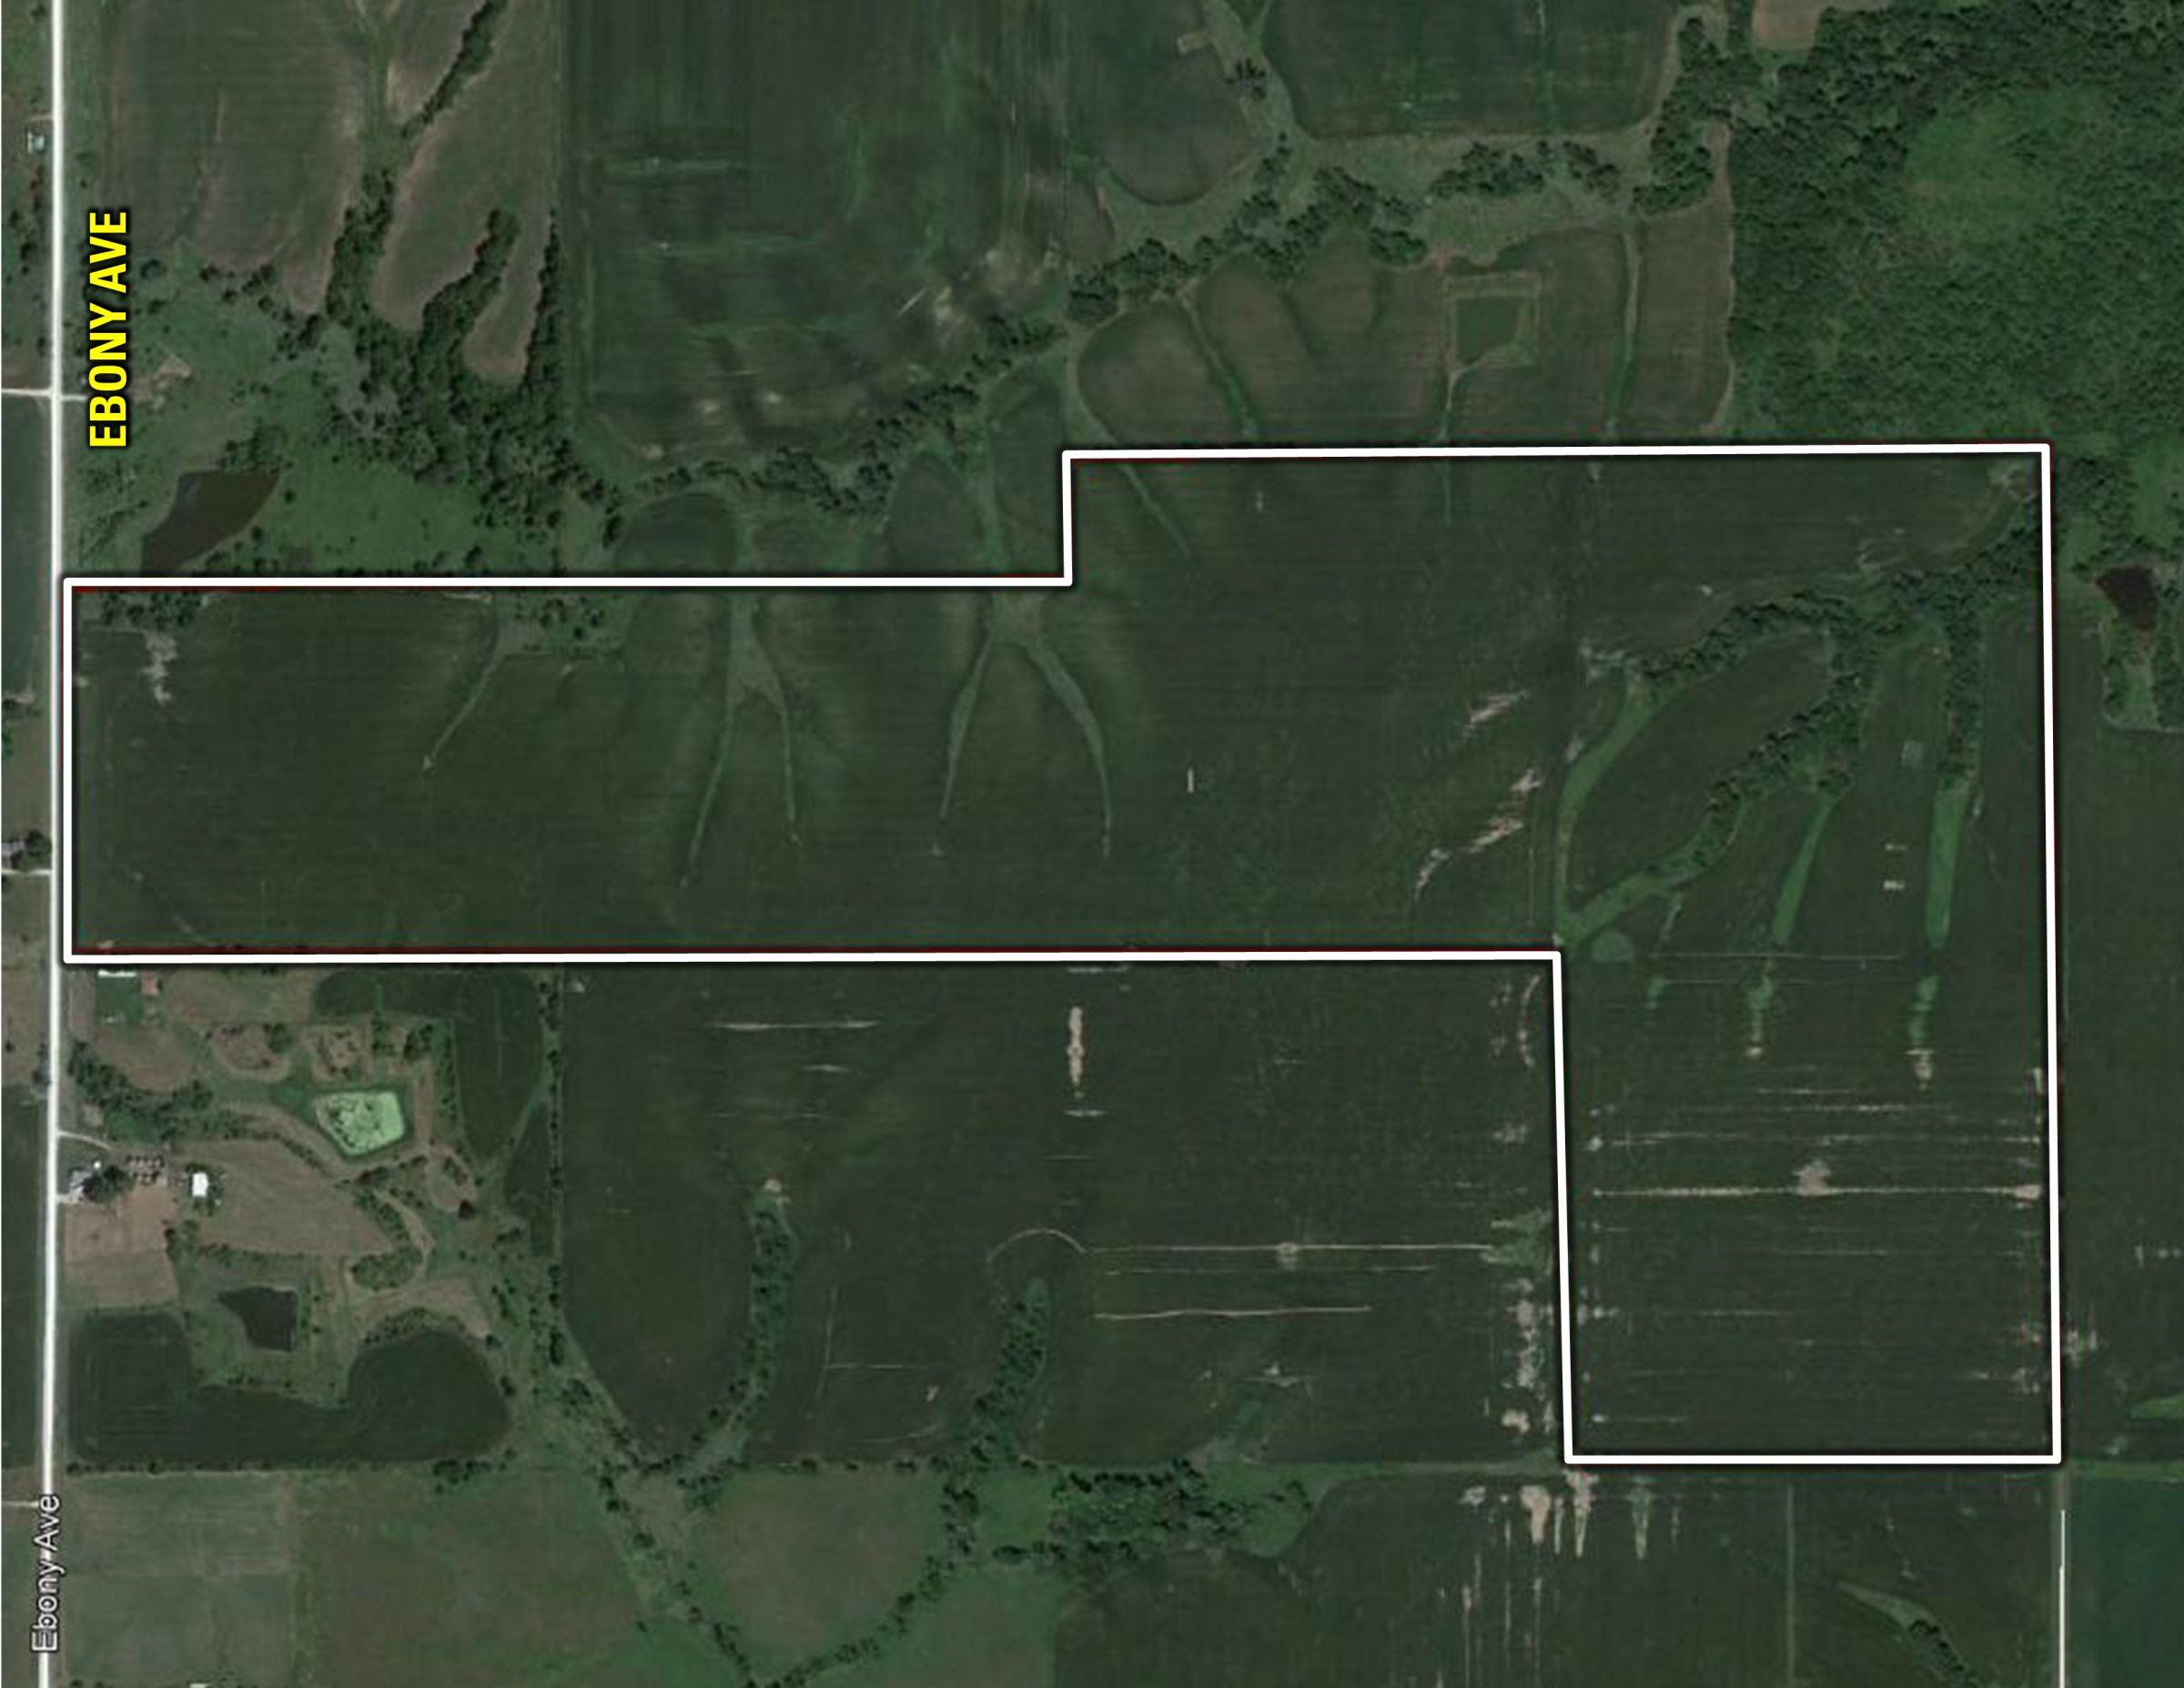 land-davis-county-iowa-180-acres-listing-number-15360-0-2021-02-15-230220.jpg